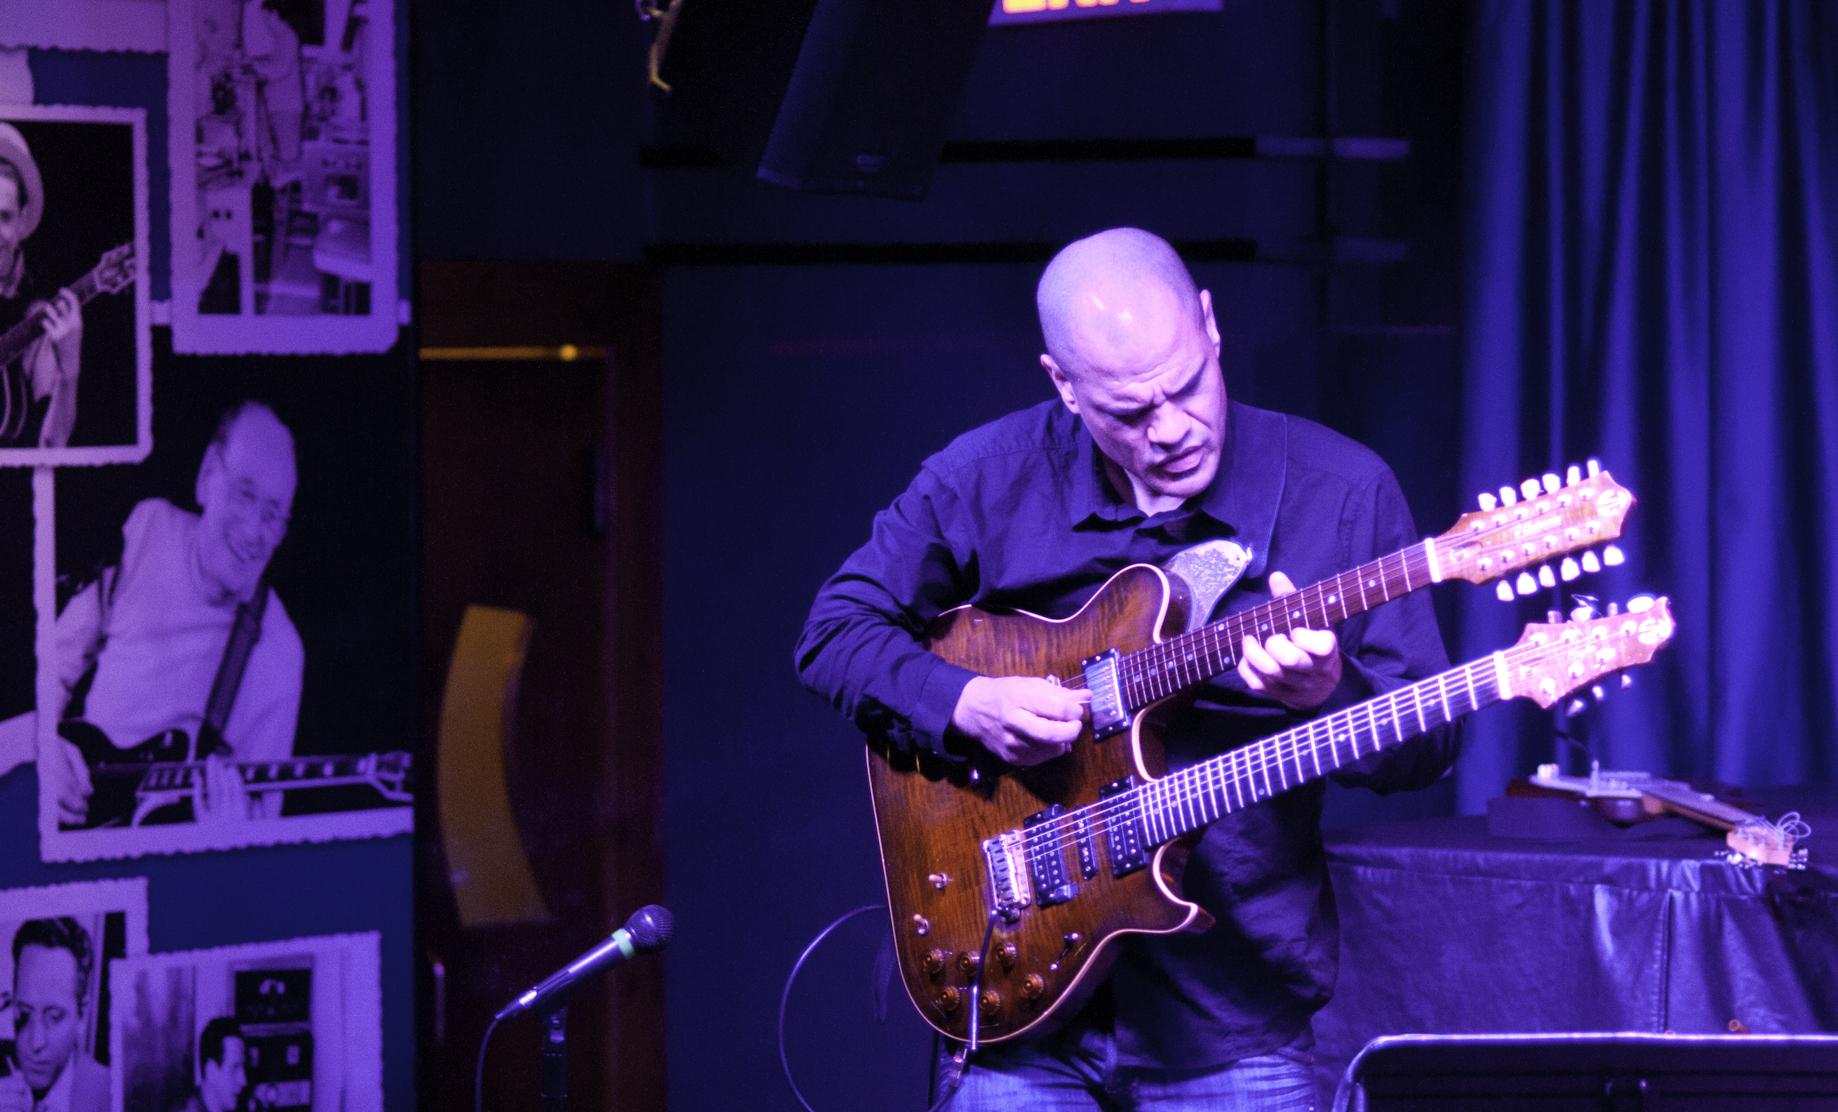 David Fiuczynski Duet with les Paul